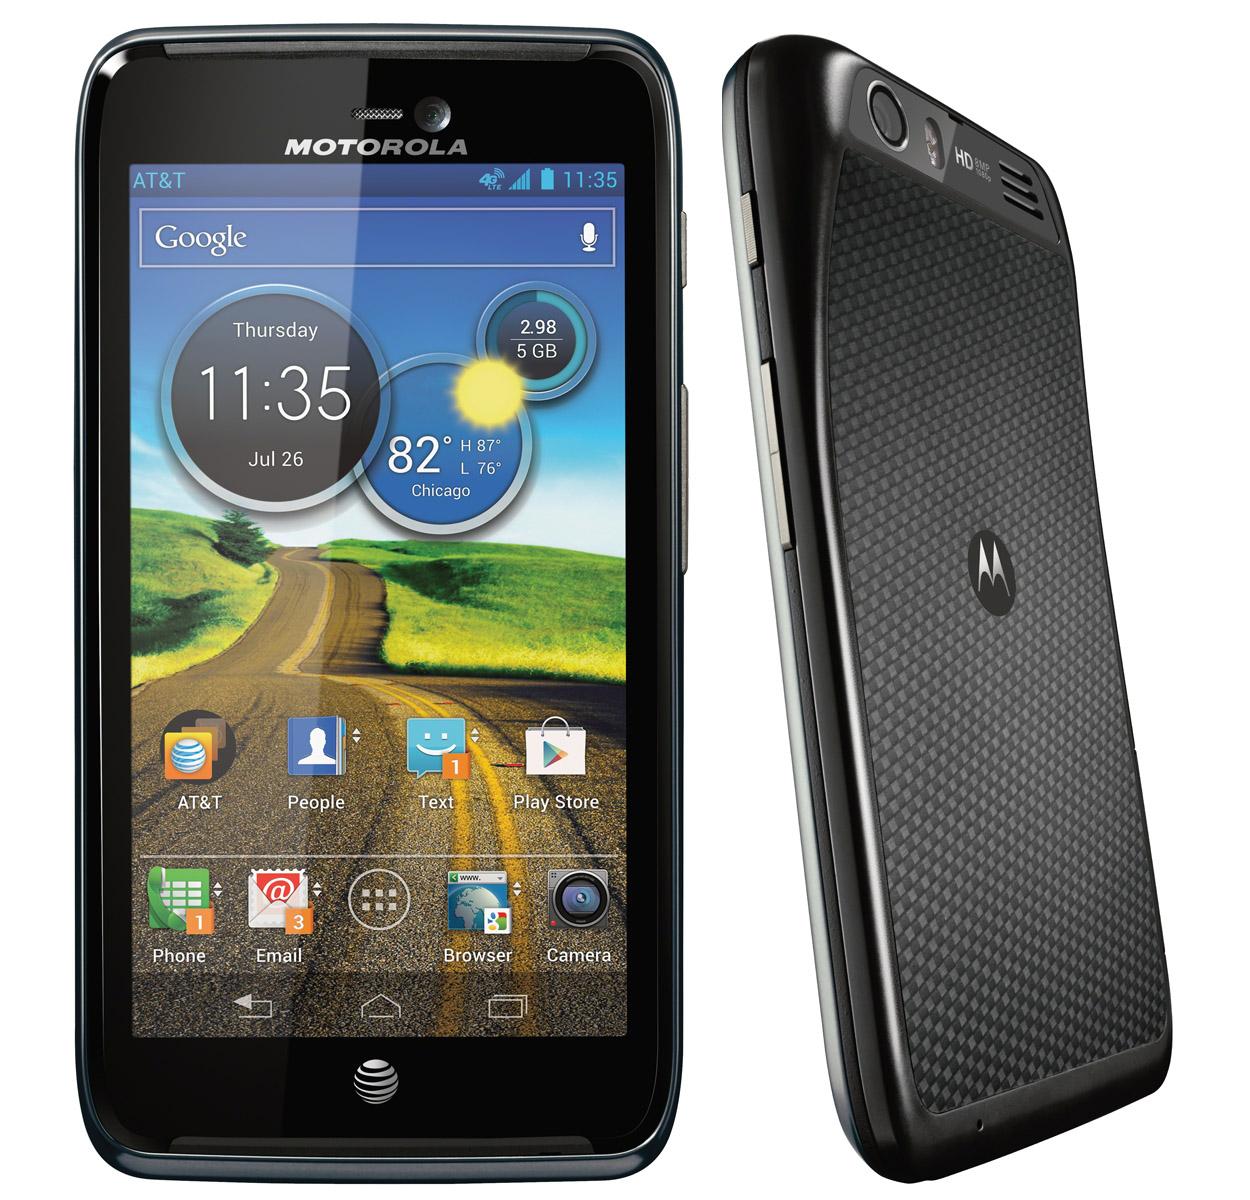 Motorola imei 4